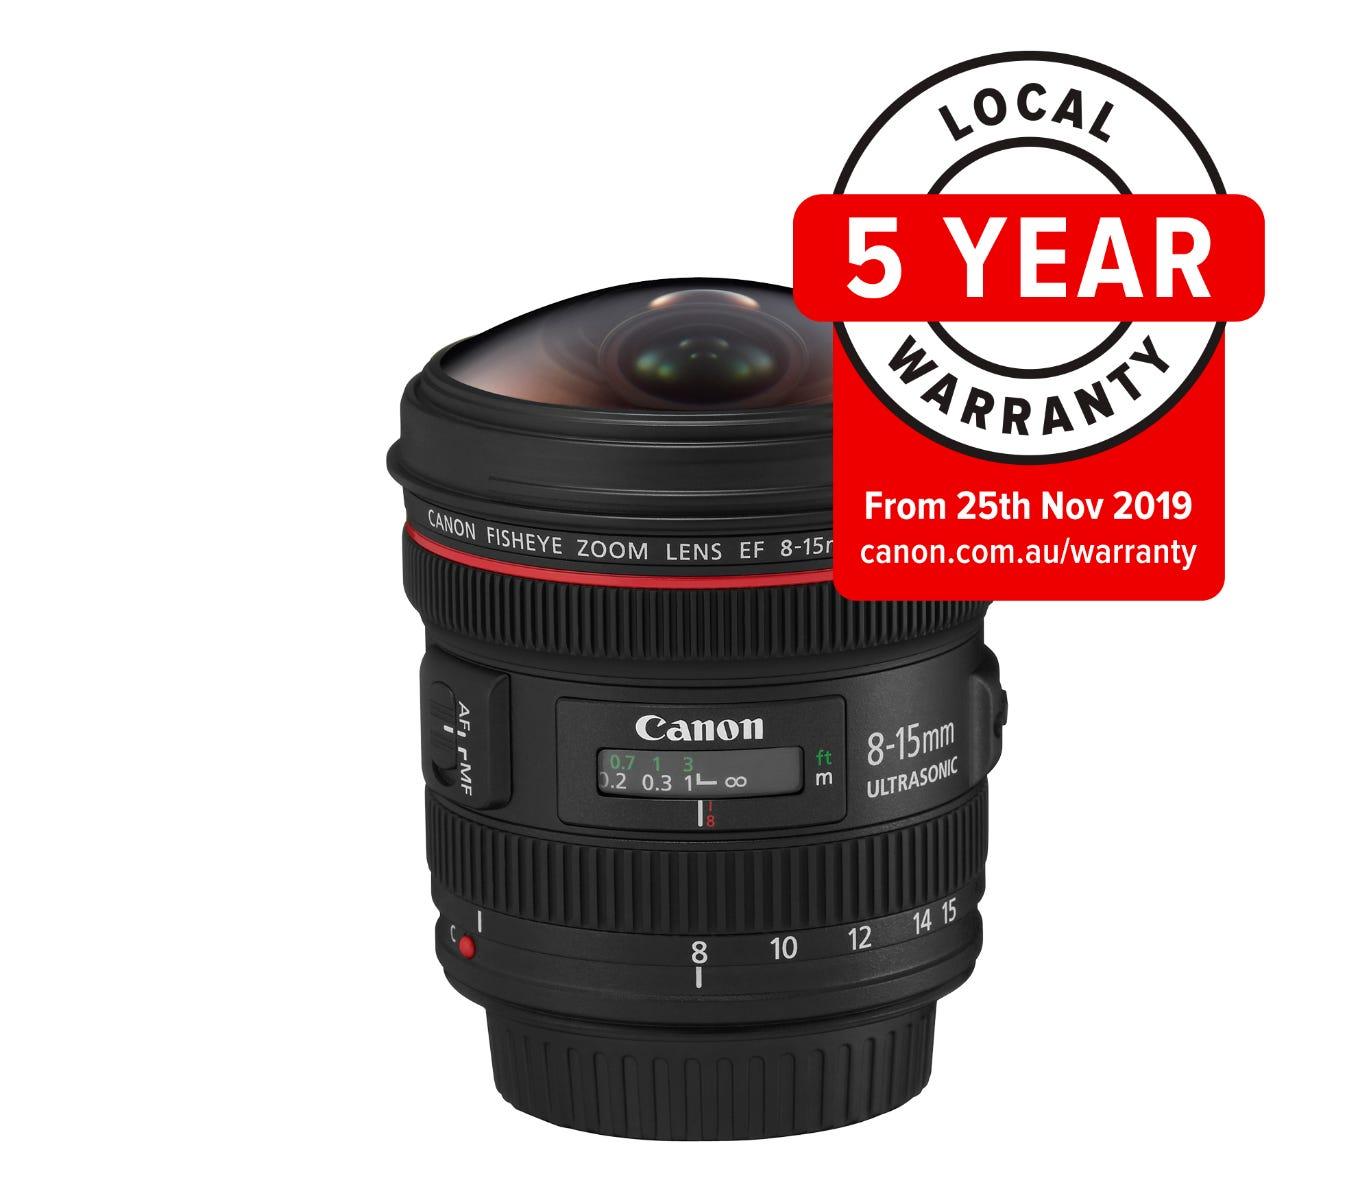 Canon EF 8-15mm f/4L Fisheye Zoom Lens - Catawiki